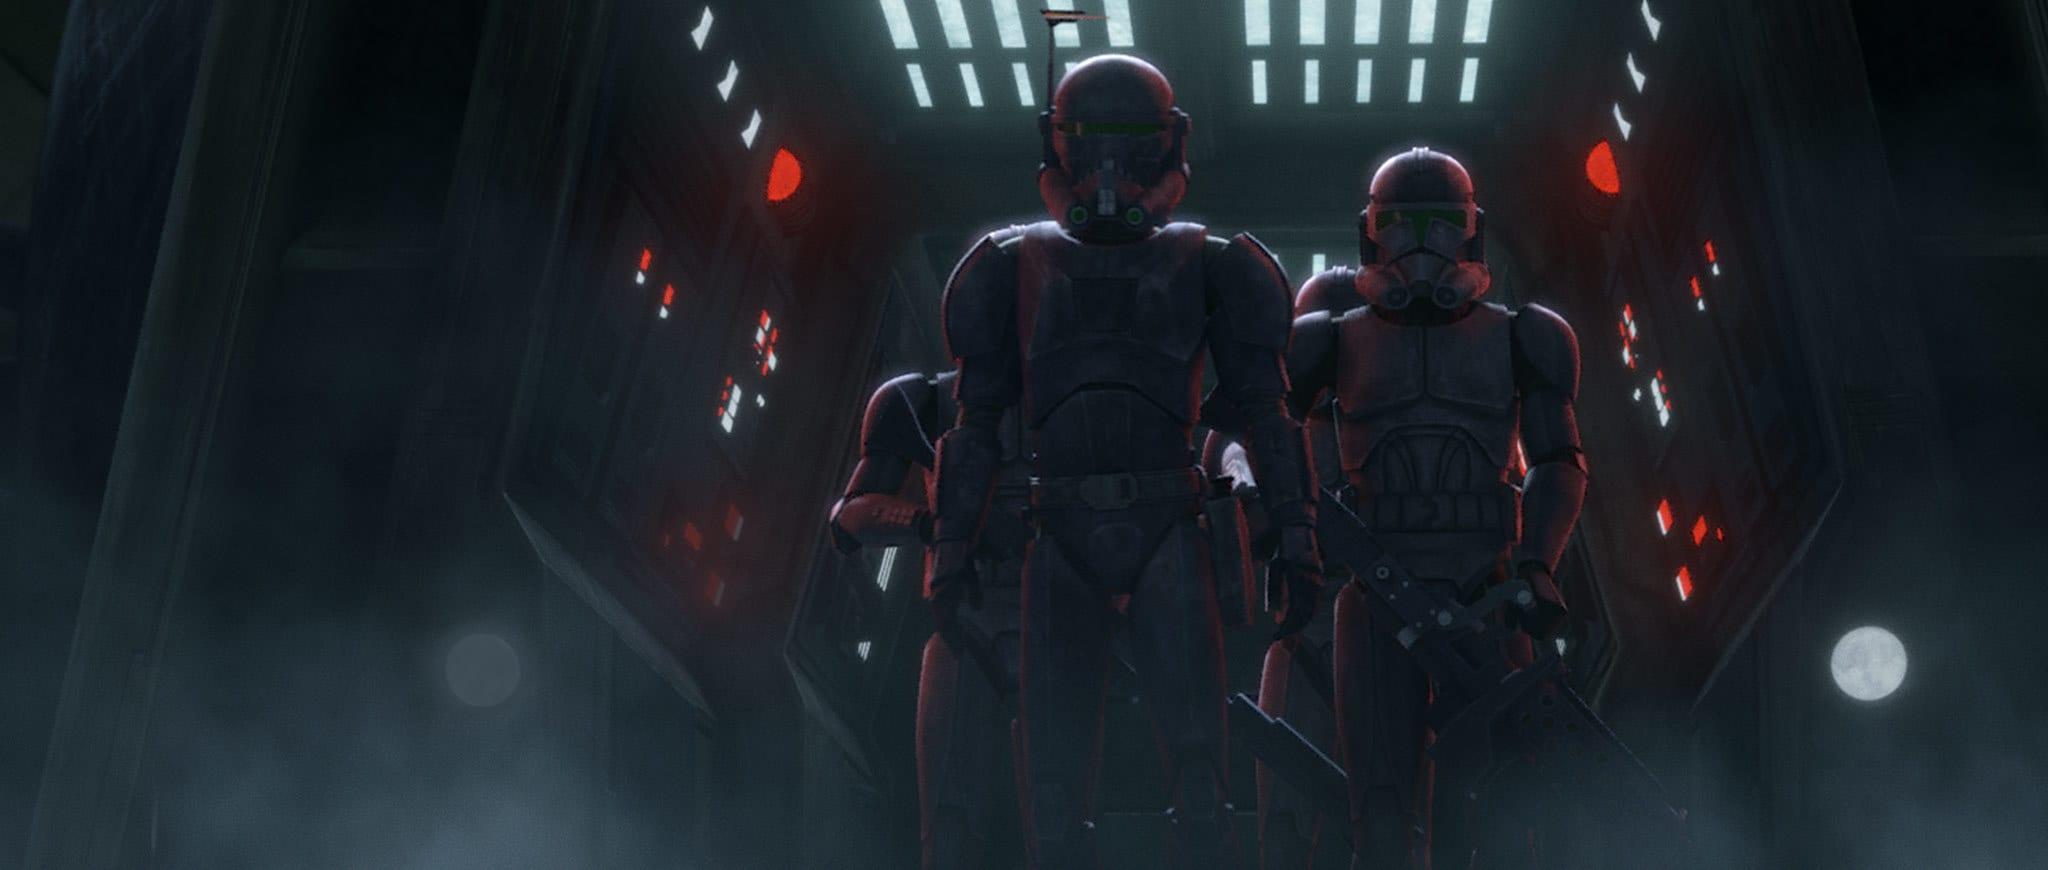 Star Wars: The Bad Batch - Episódio 3 - Crítica do Chippu